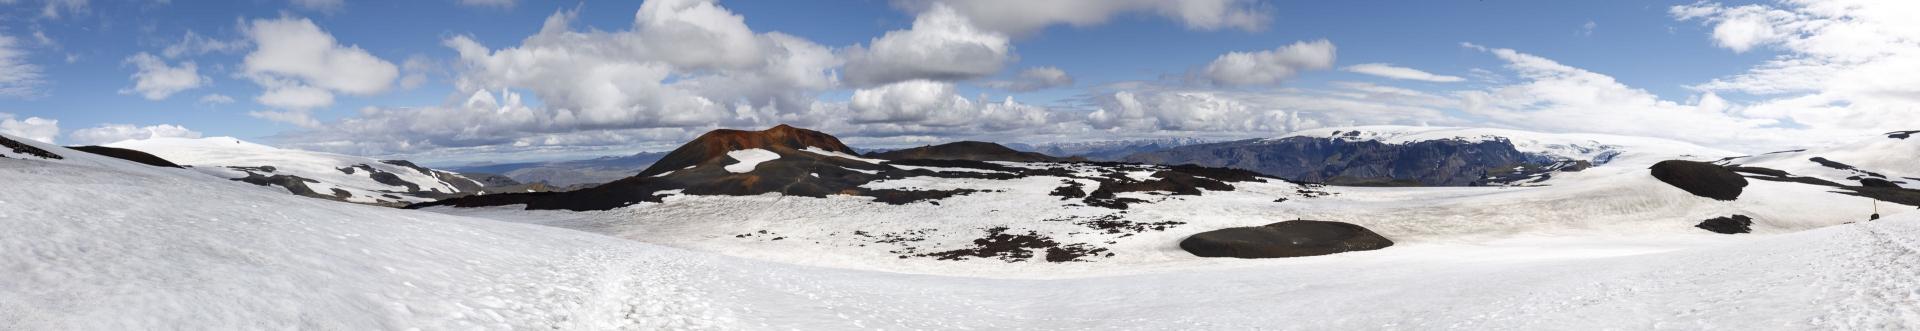 Eyjafjallajökull, Magni, Goðahraun, Mýrdalsjökull